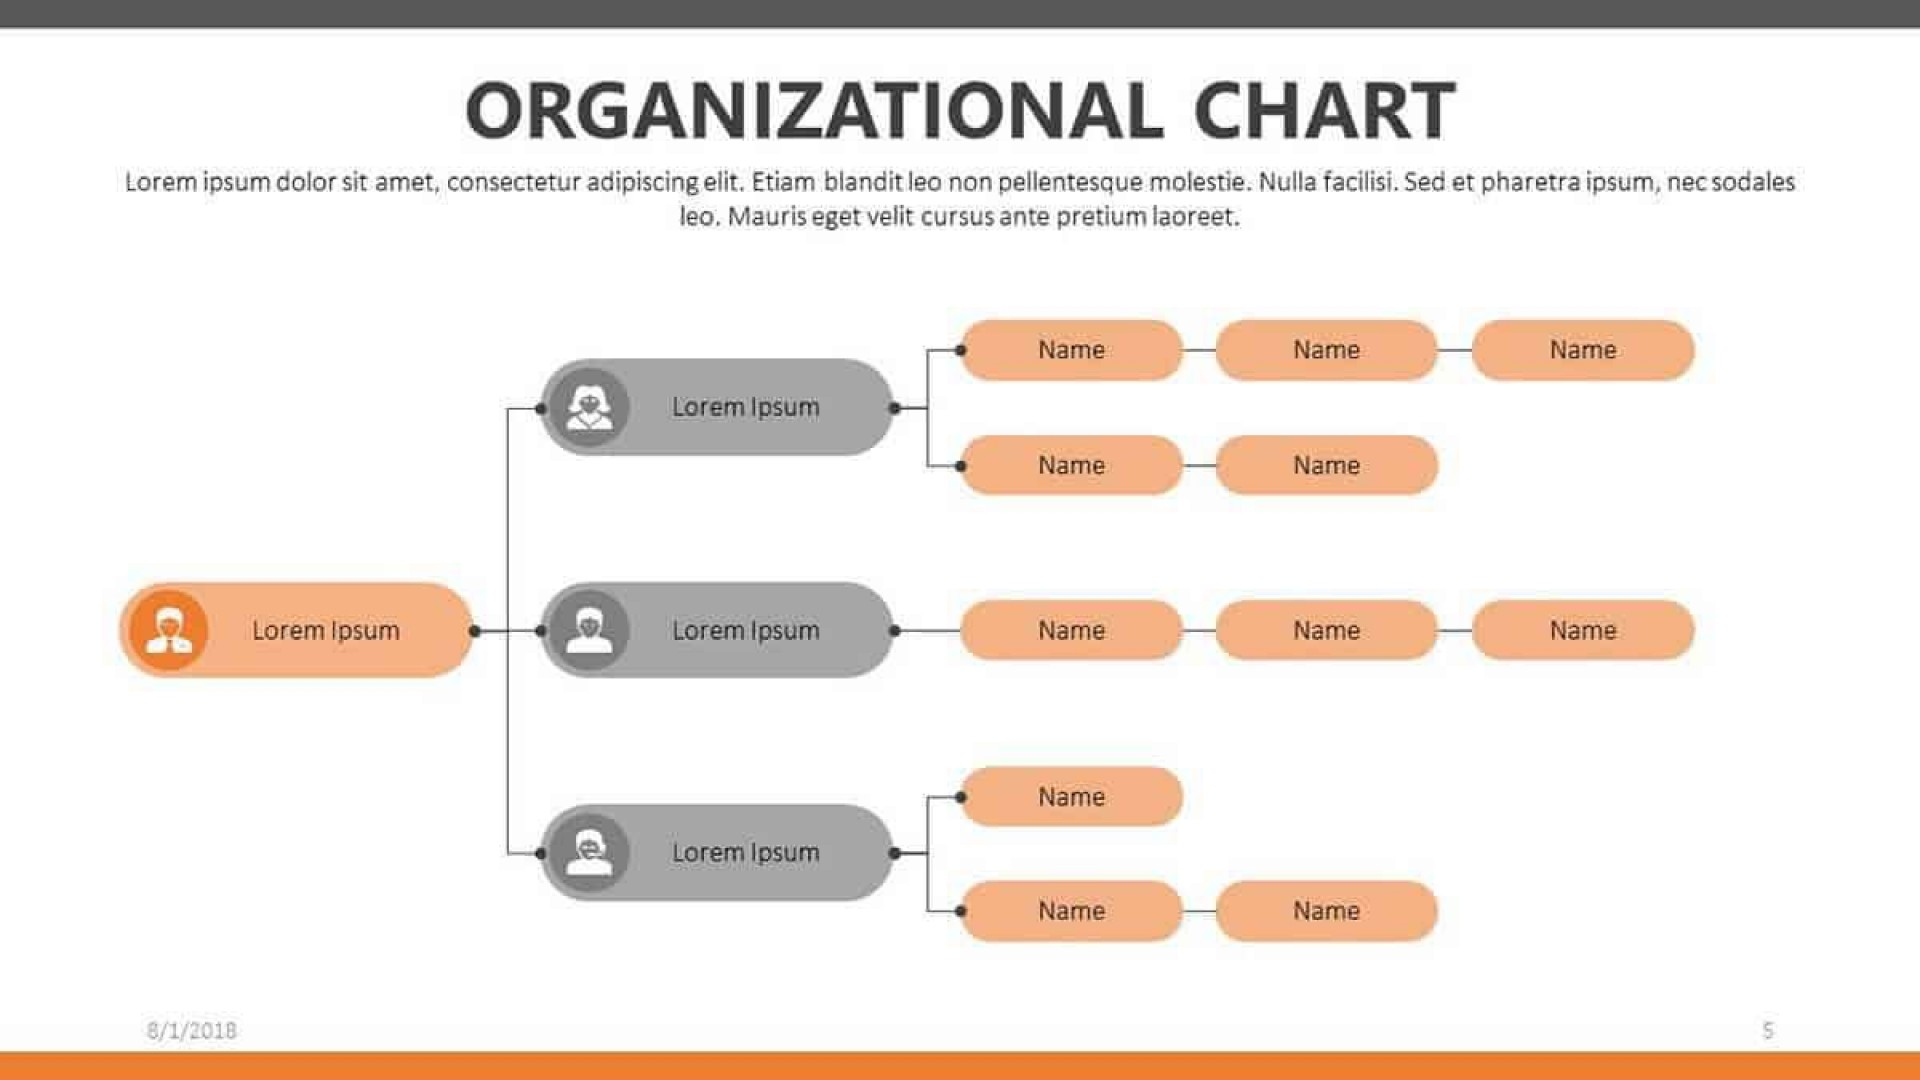 010 Imposing Organizational Chart Template Powerpoint Free Photo  Download 2010 Organization1920